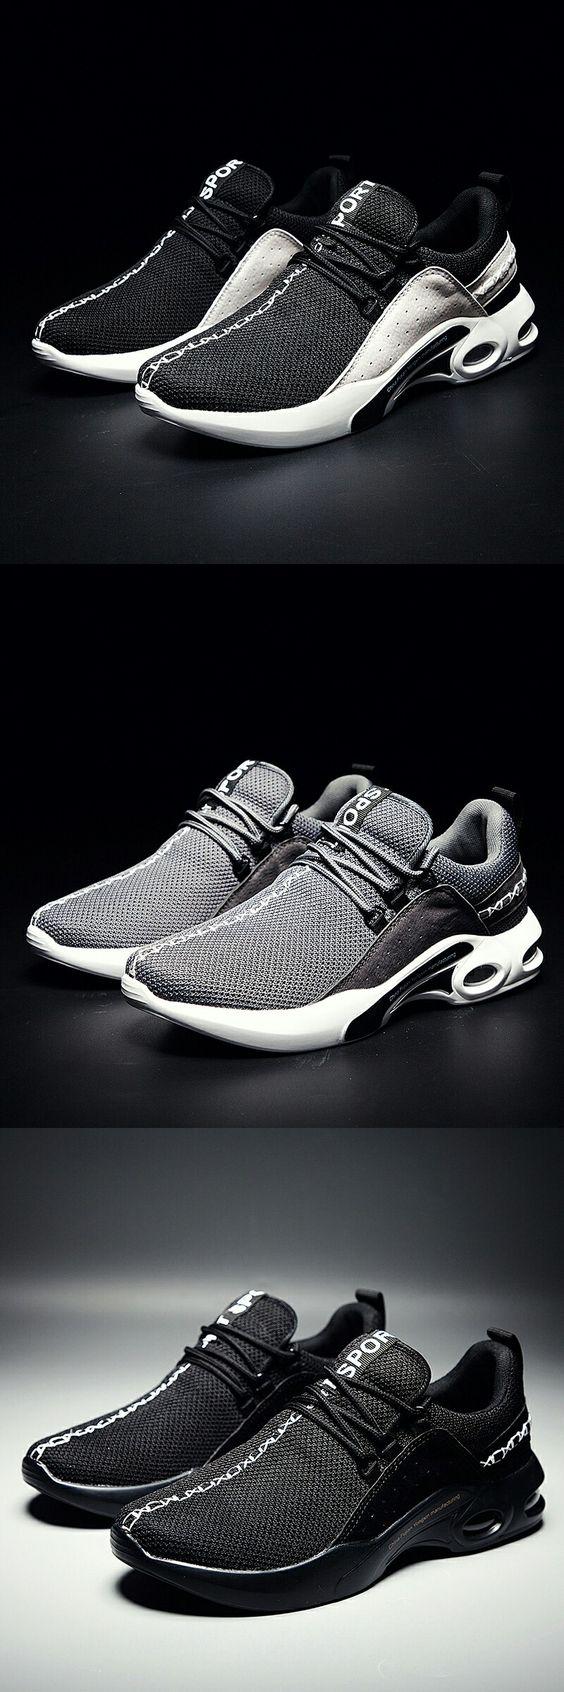 US $24.97 <Click to buy> Prikol Brand Mens Sport Running Shoes Breathable Jogging Outdoor Air Cushion Sneakers Men Outdoor Zapatillas Zapatos Hombres